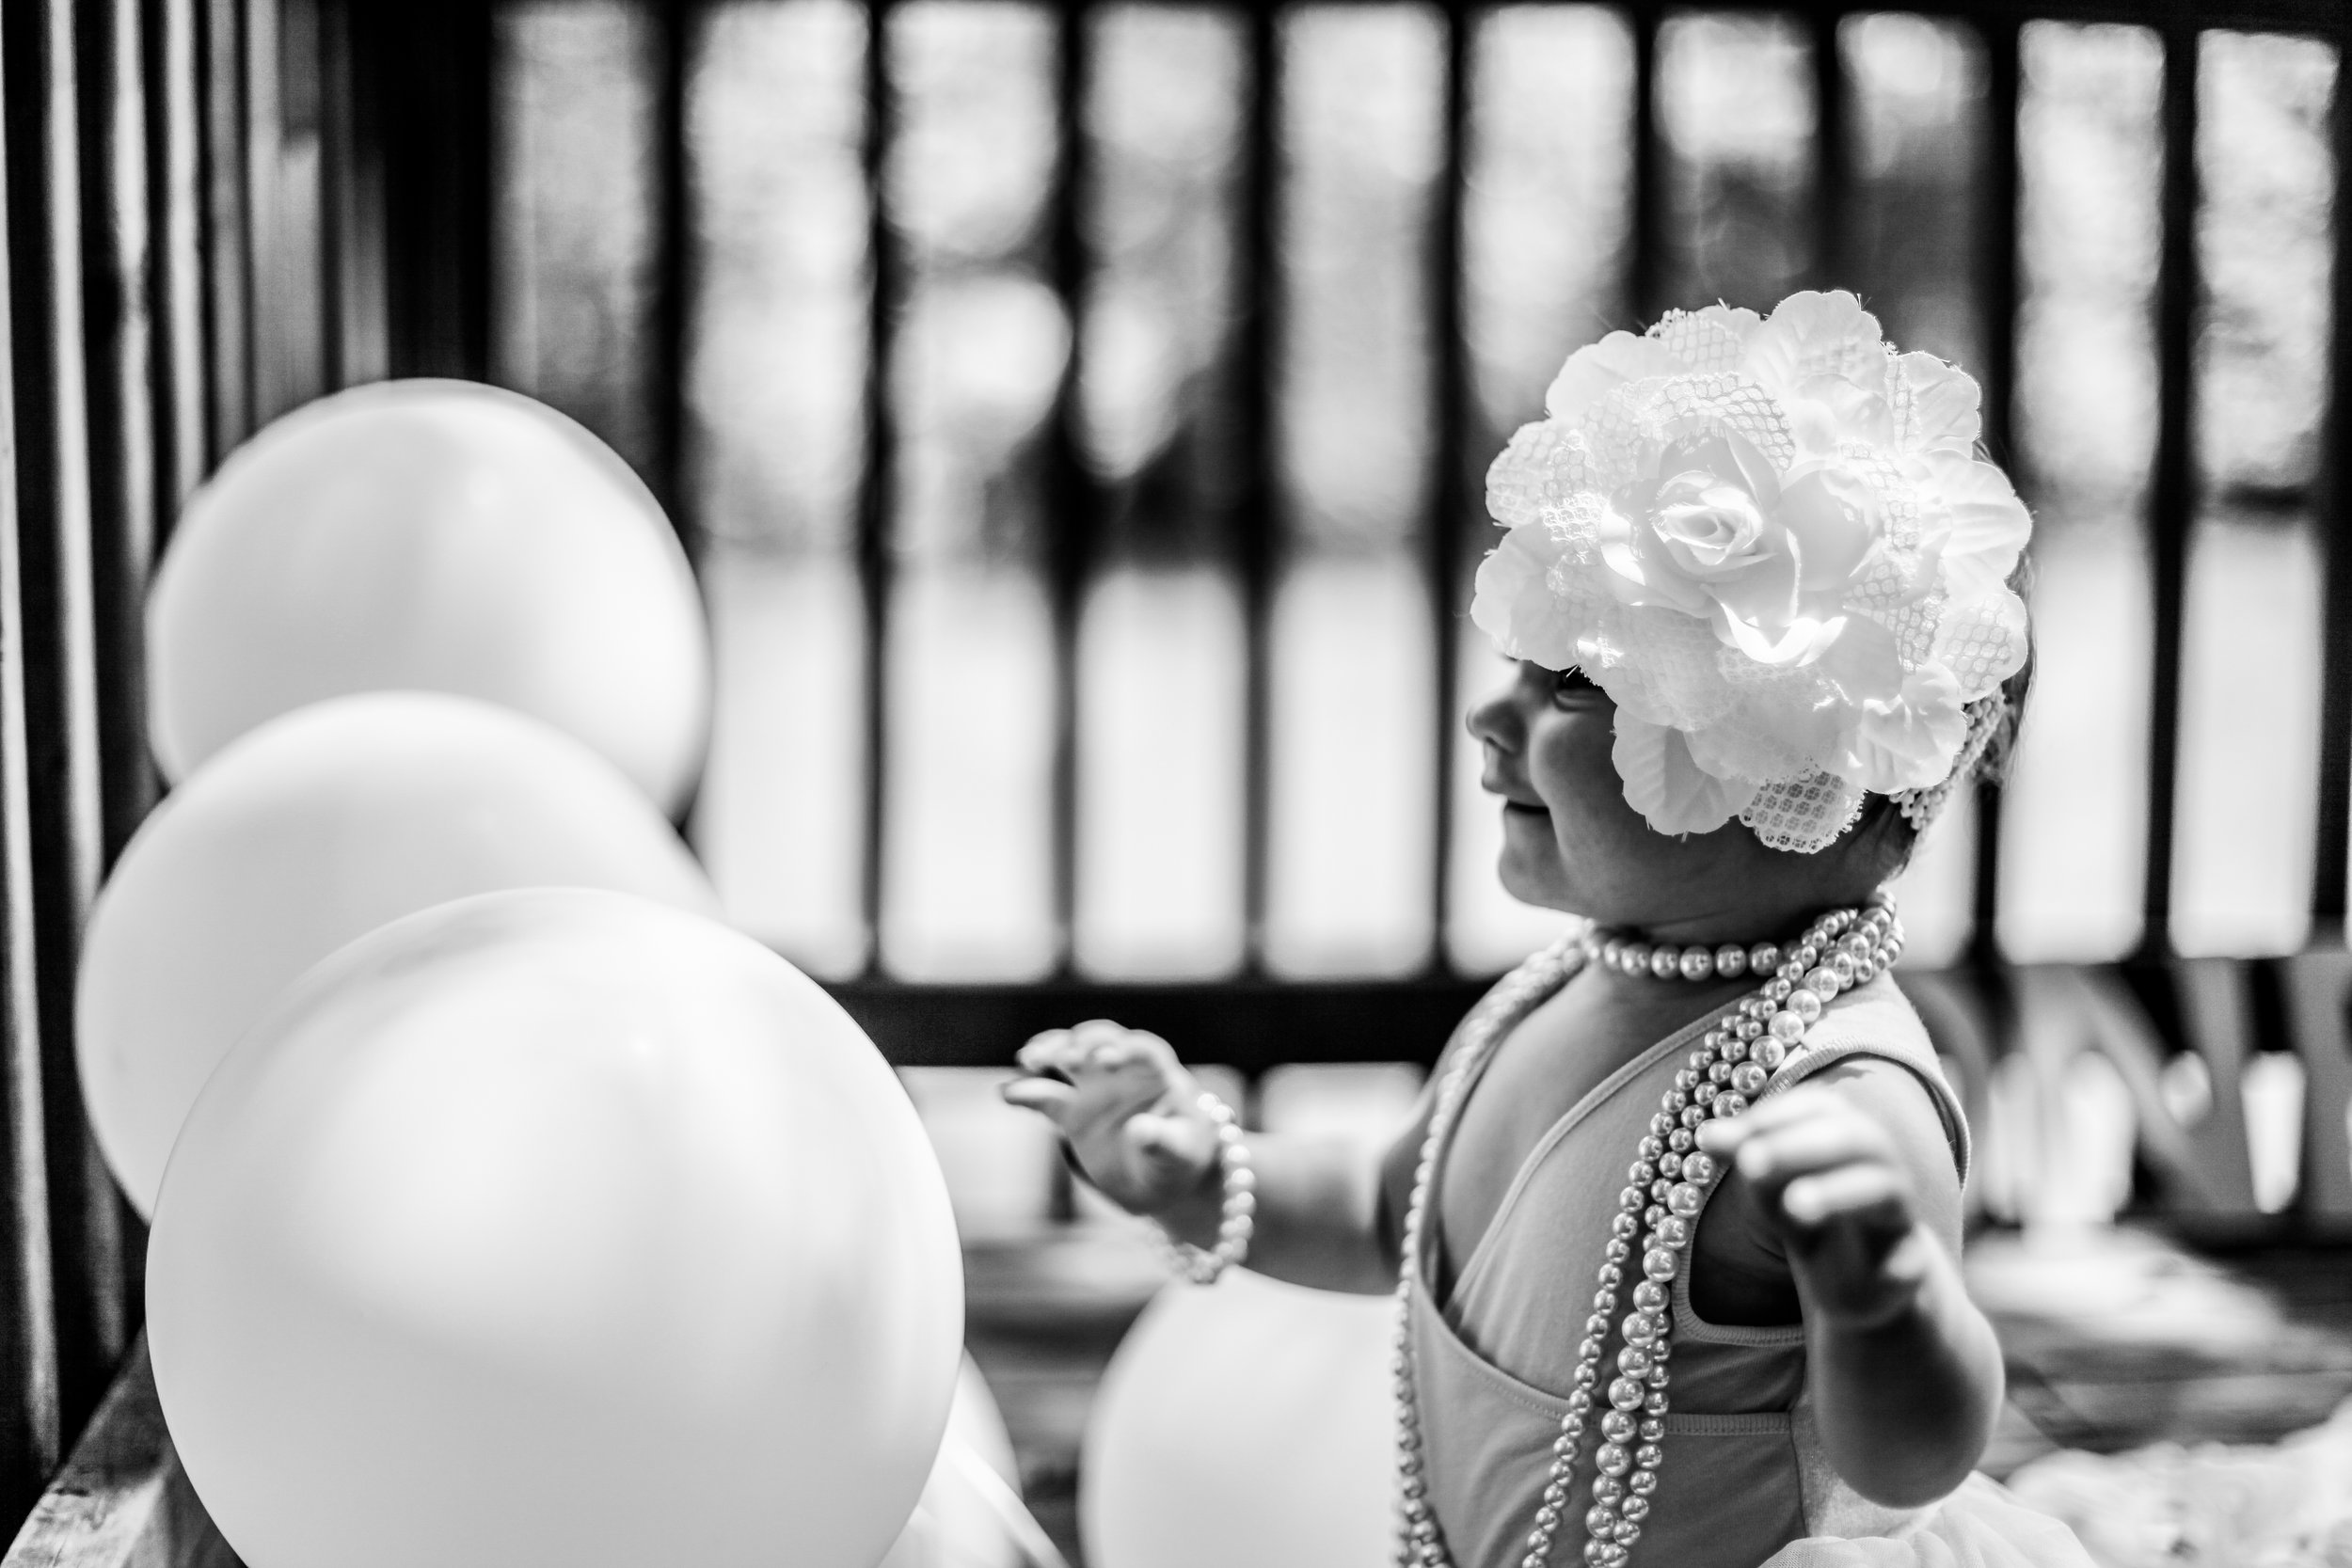 woodstock baby photography angela elliott-44.jpg